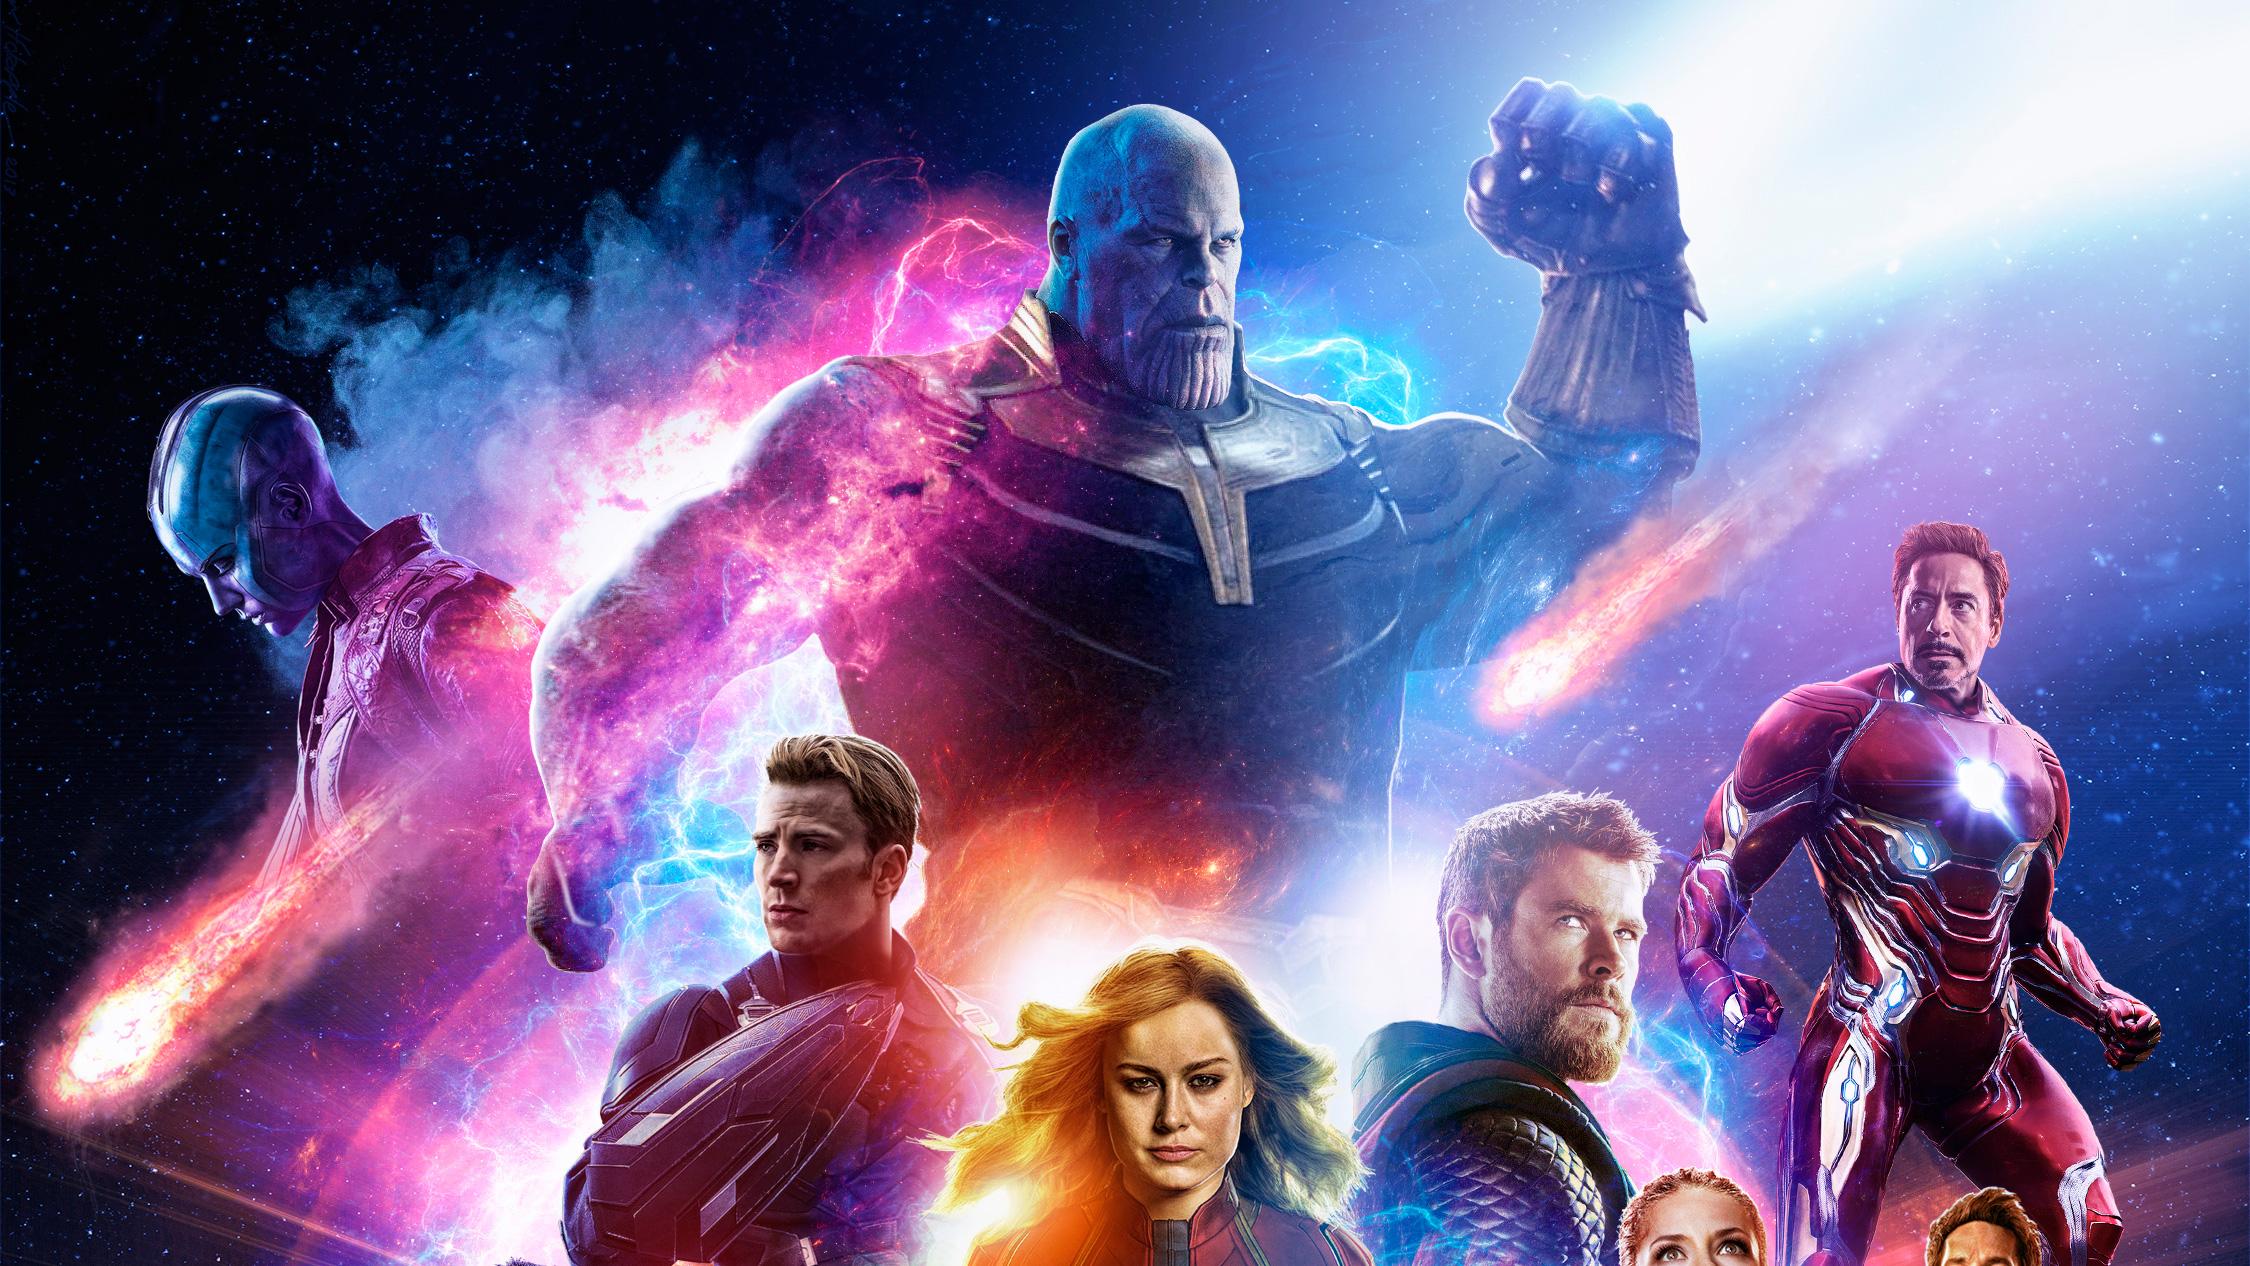 Avengers Endgame Wallpaper Gif 2250x1266 Wallpaper Teahub Io